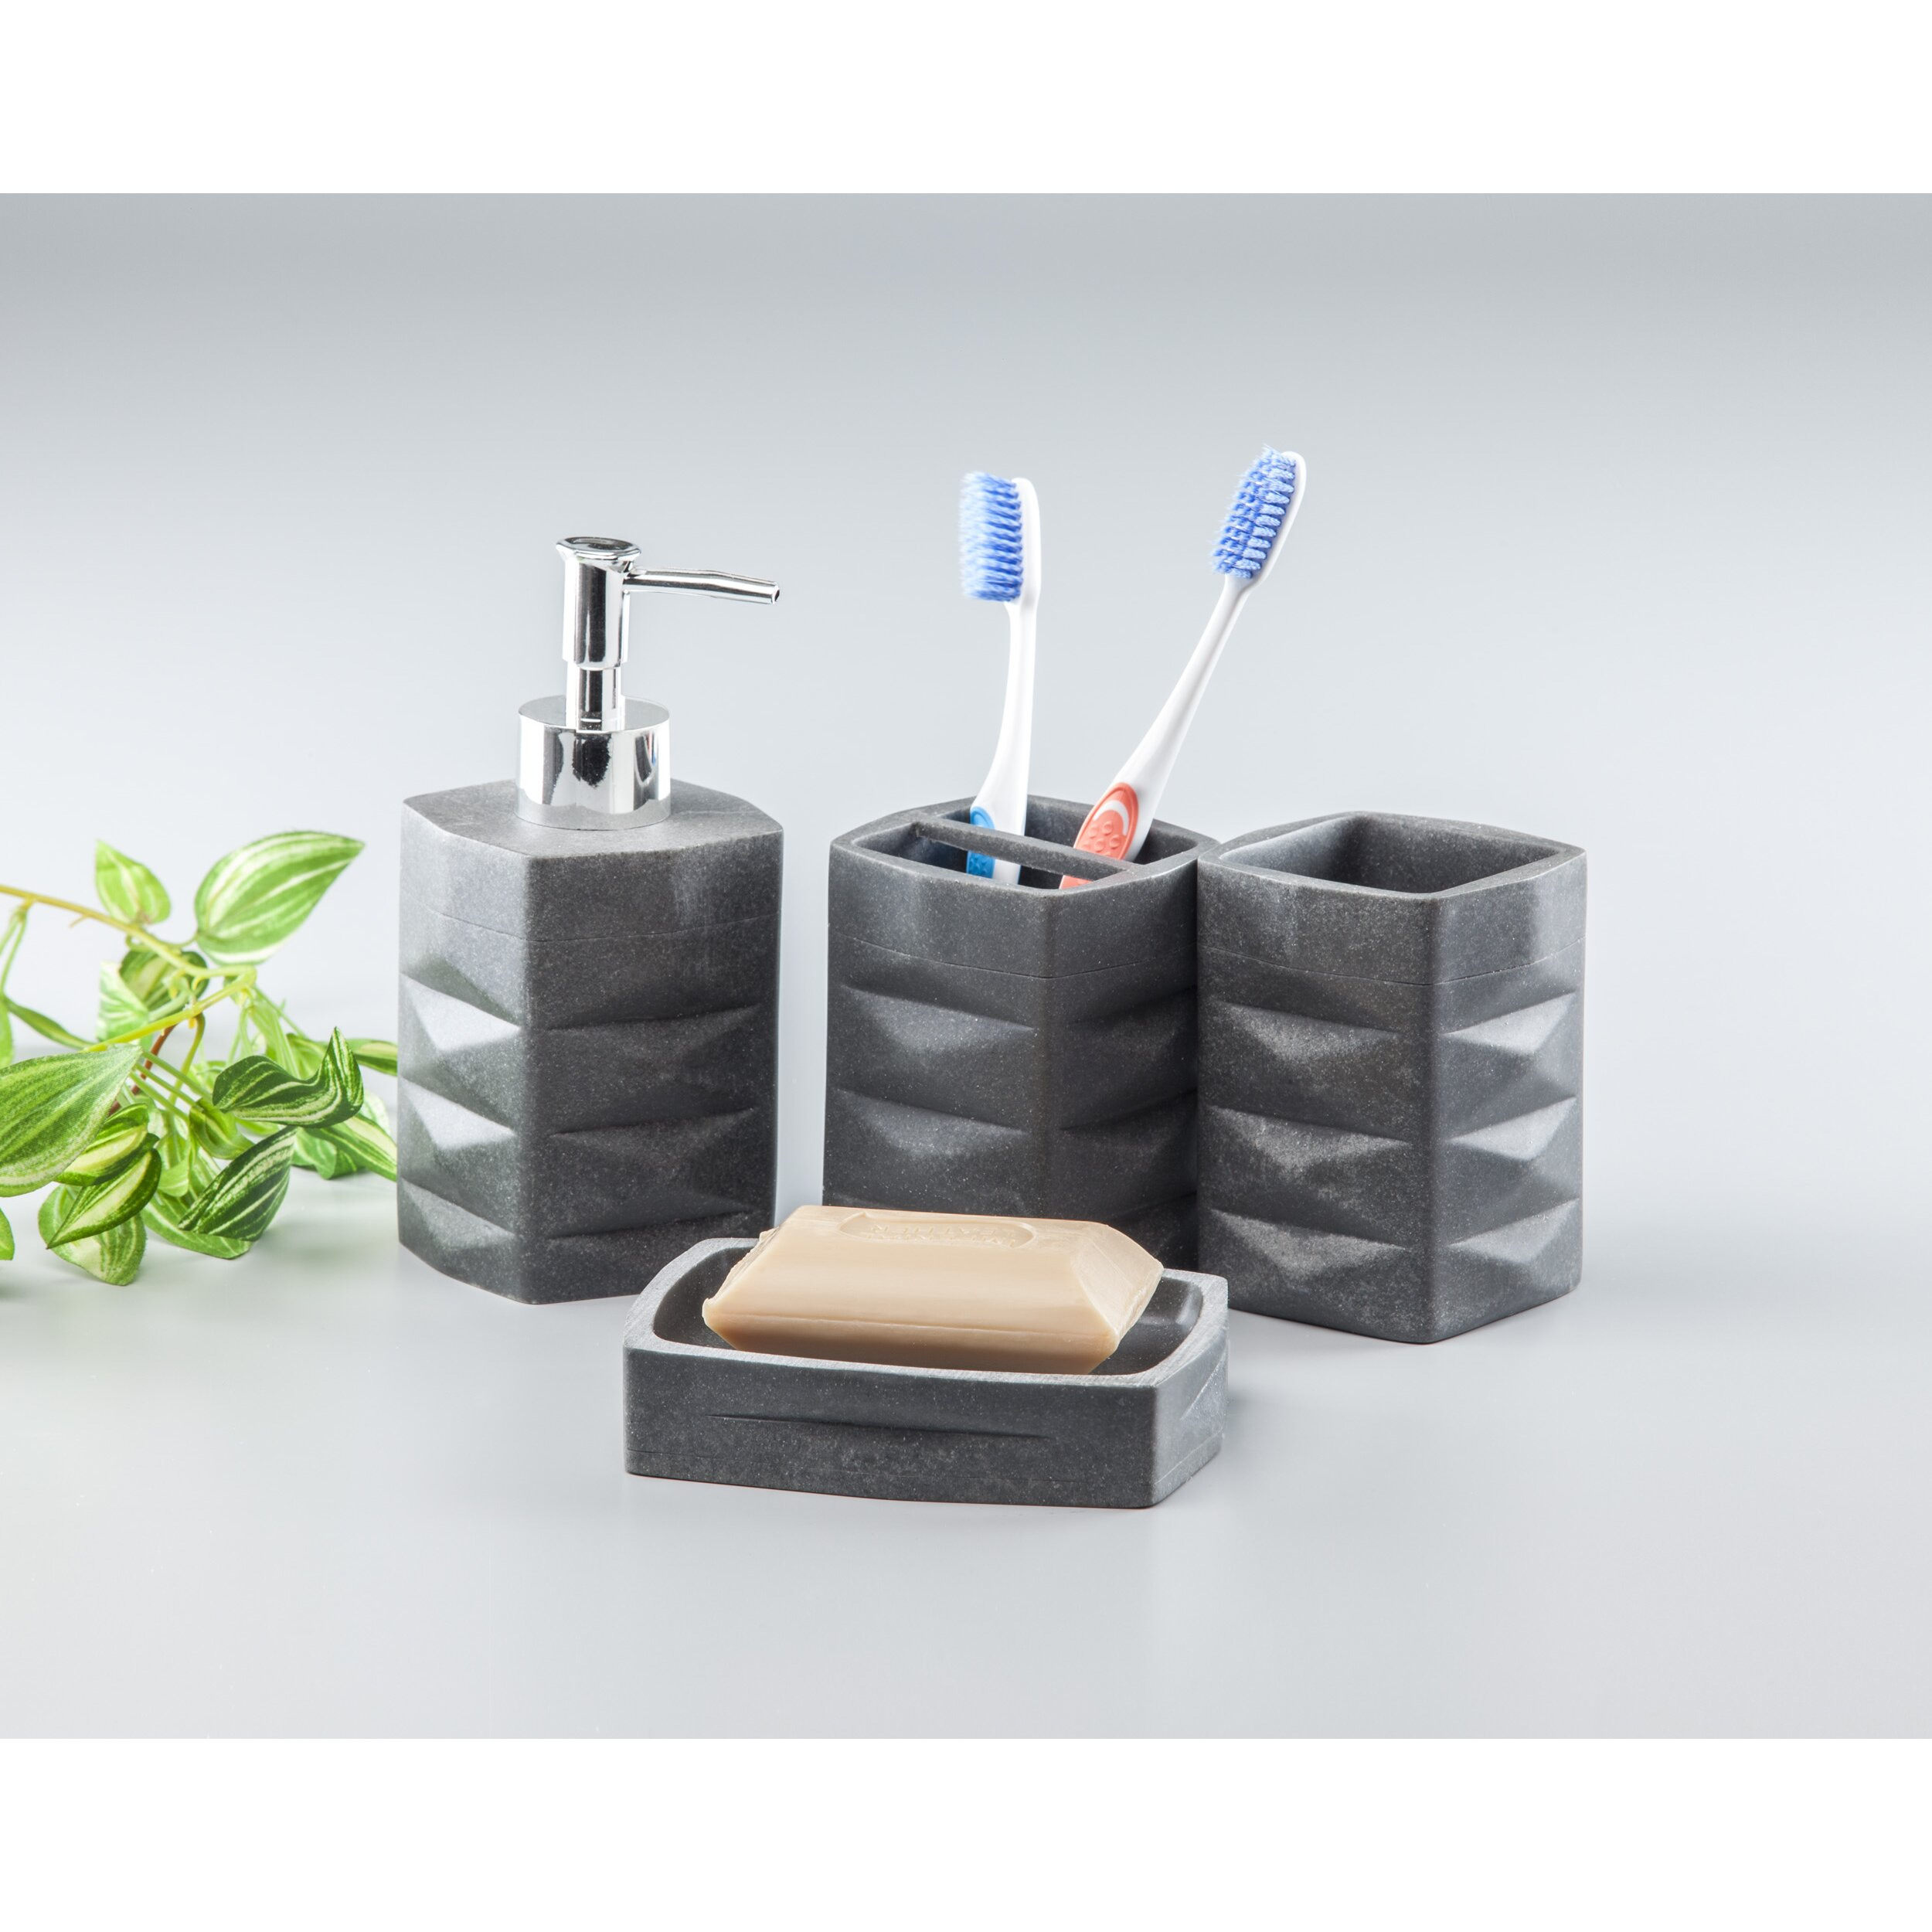 Innova Imports 4 Piece Bathroom Set Reviews Wayfair